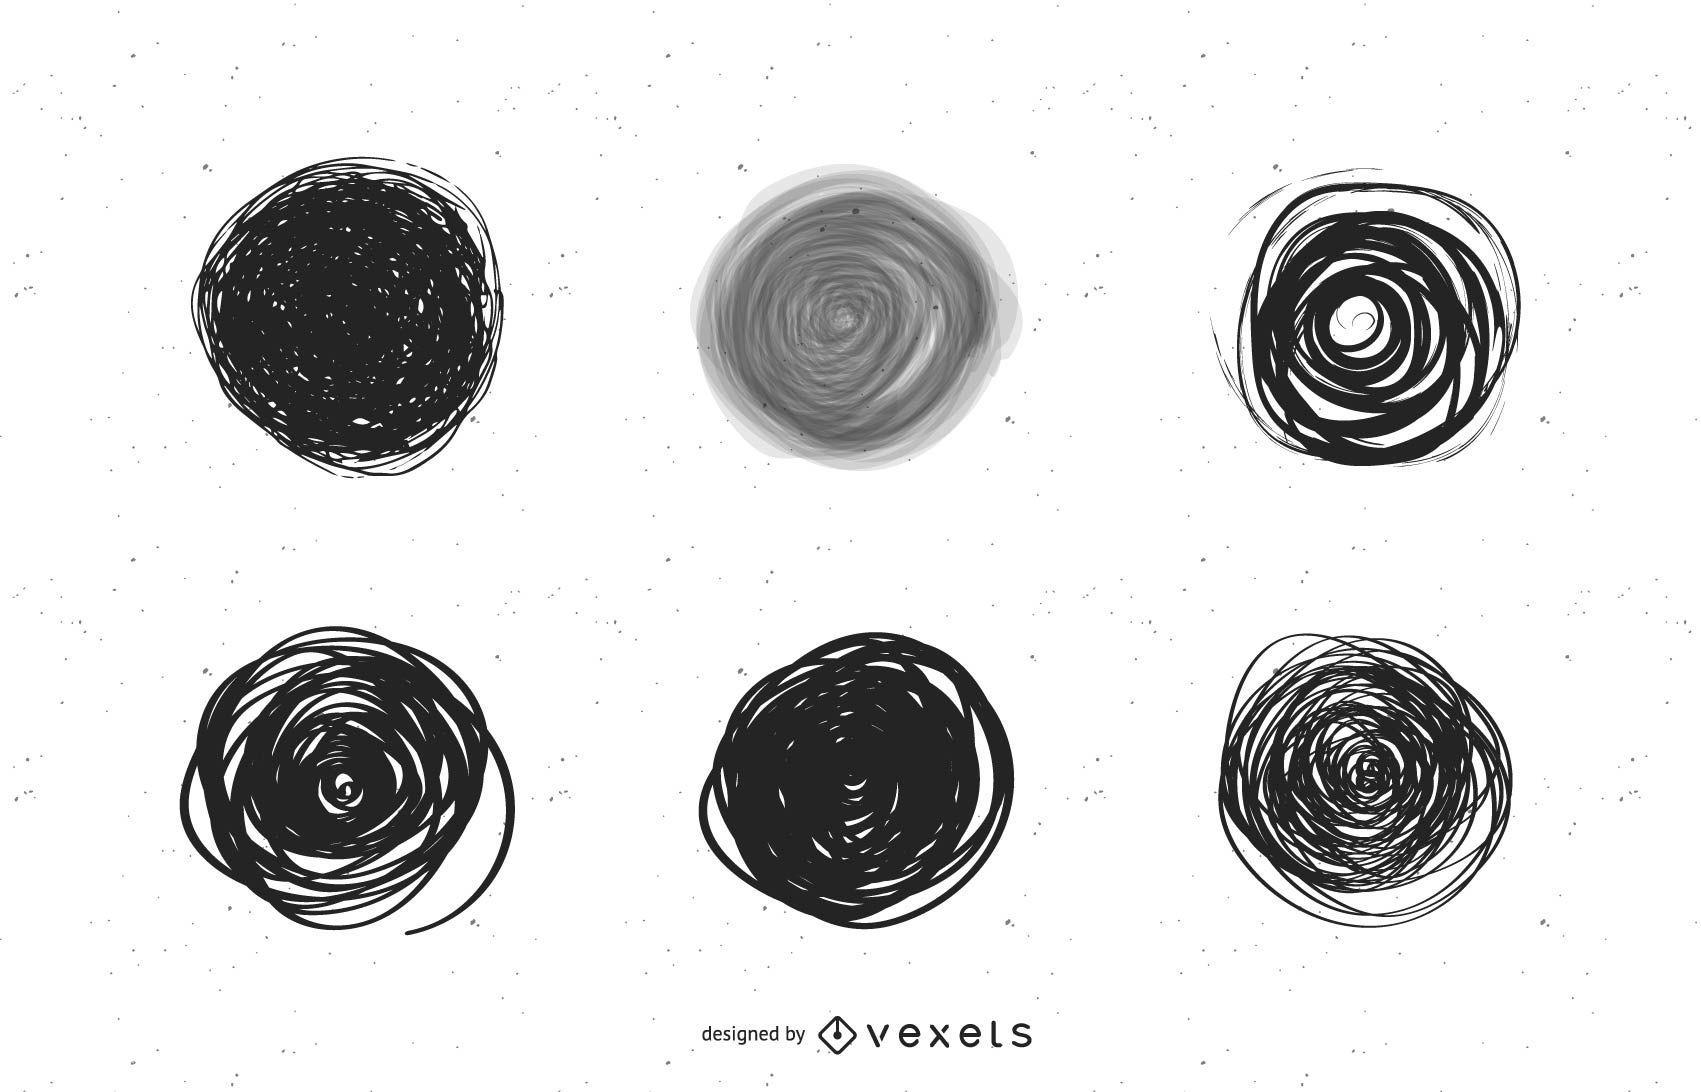 Conjunto de garabatos circulares